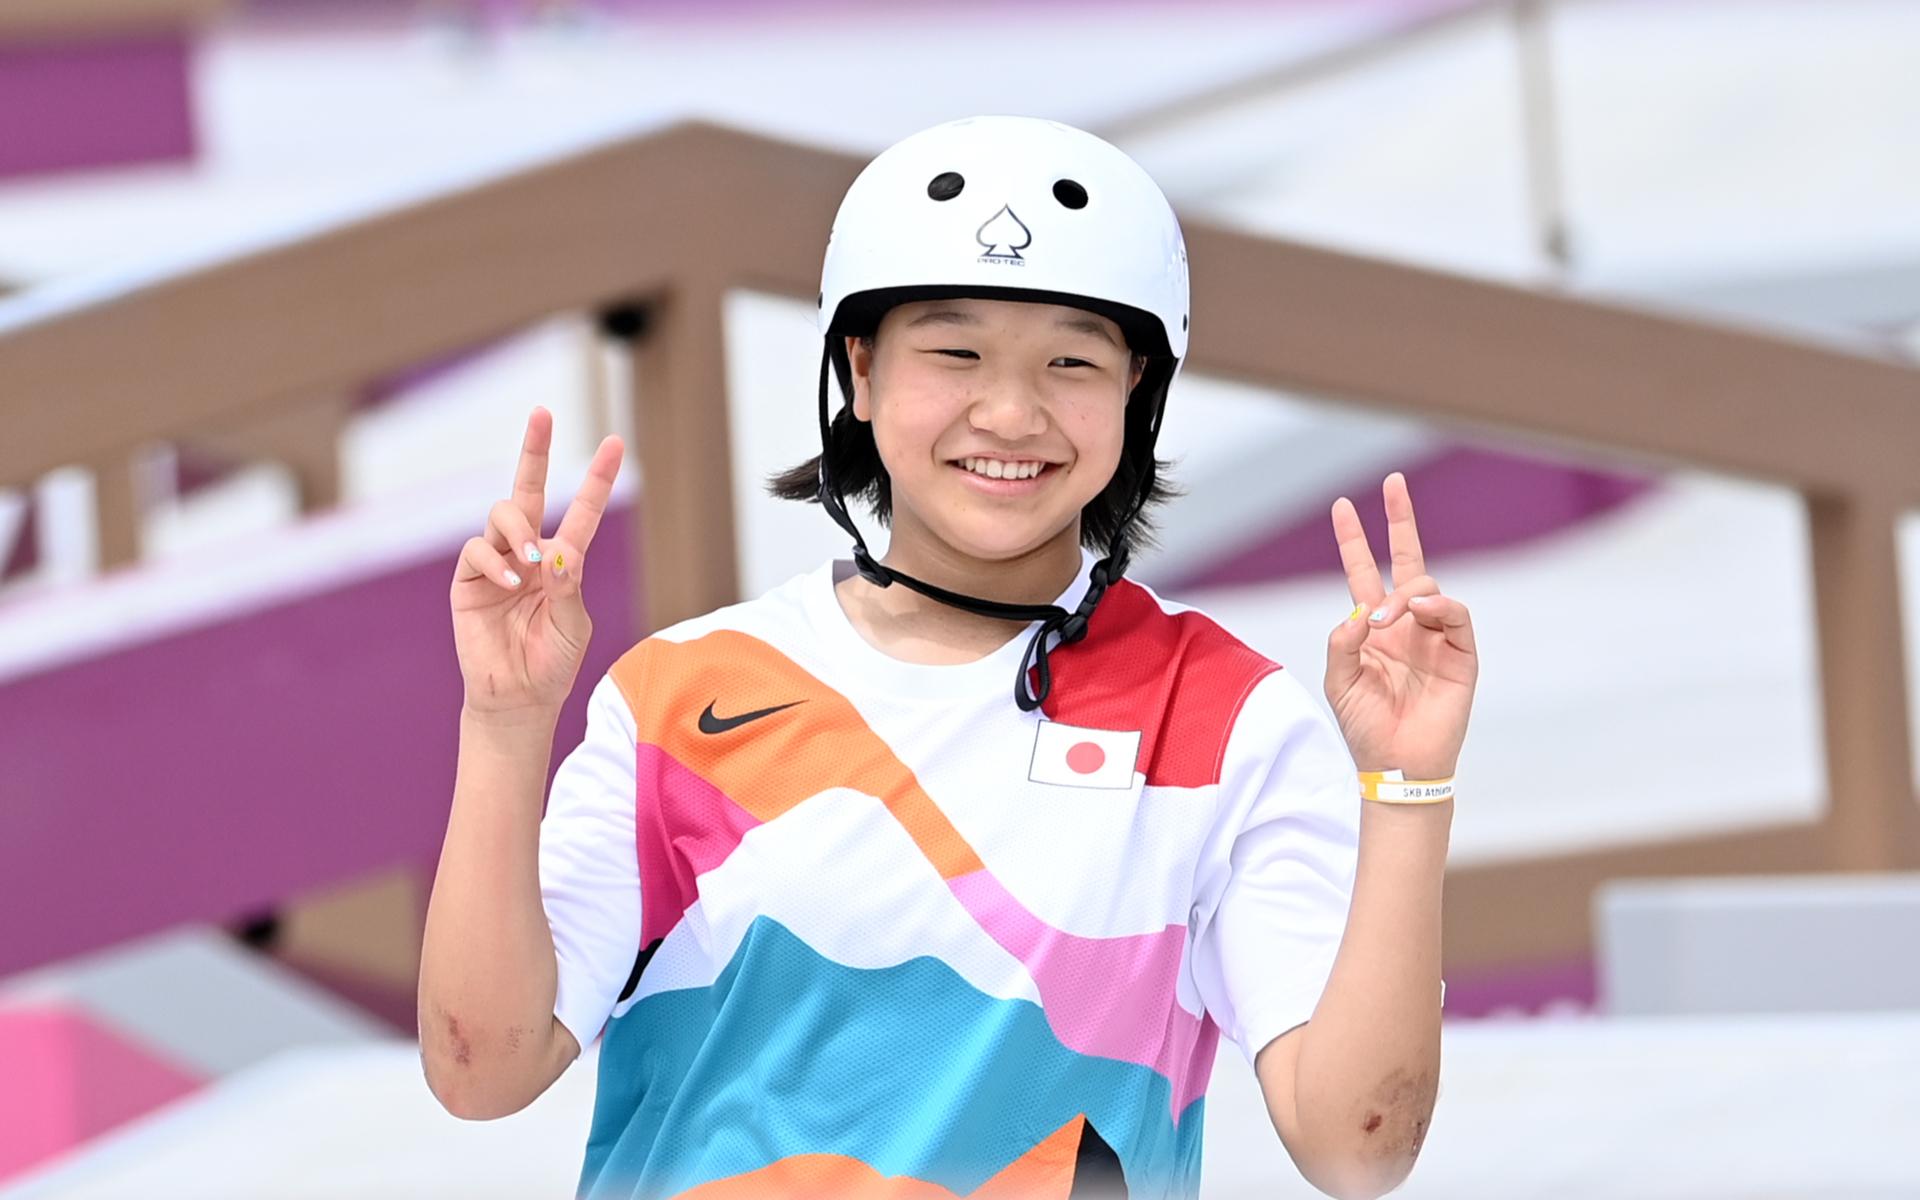 Фото: Олимпийская чемпионка по скейтбордингу Момидзи Нисия (Marijan Murat\dpa)